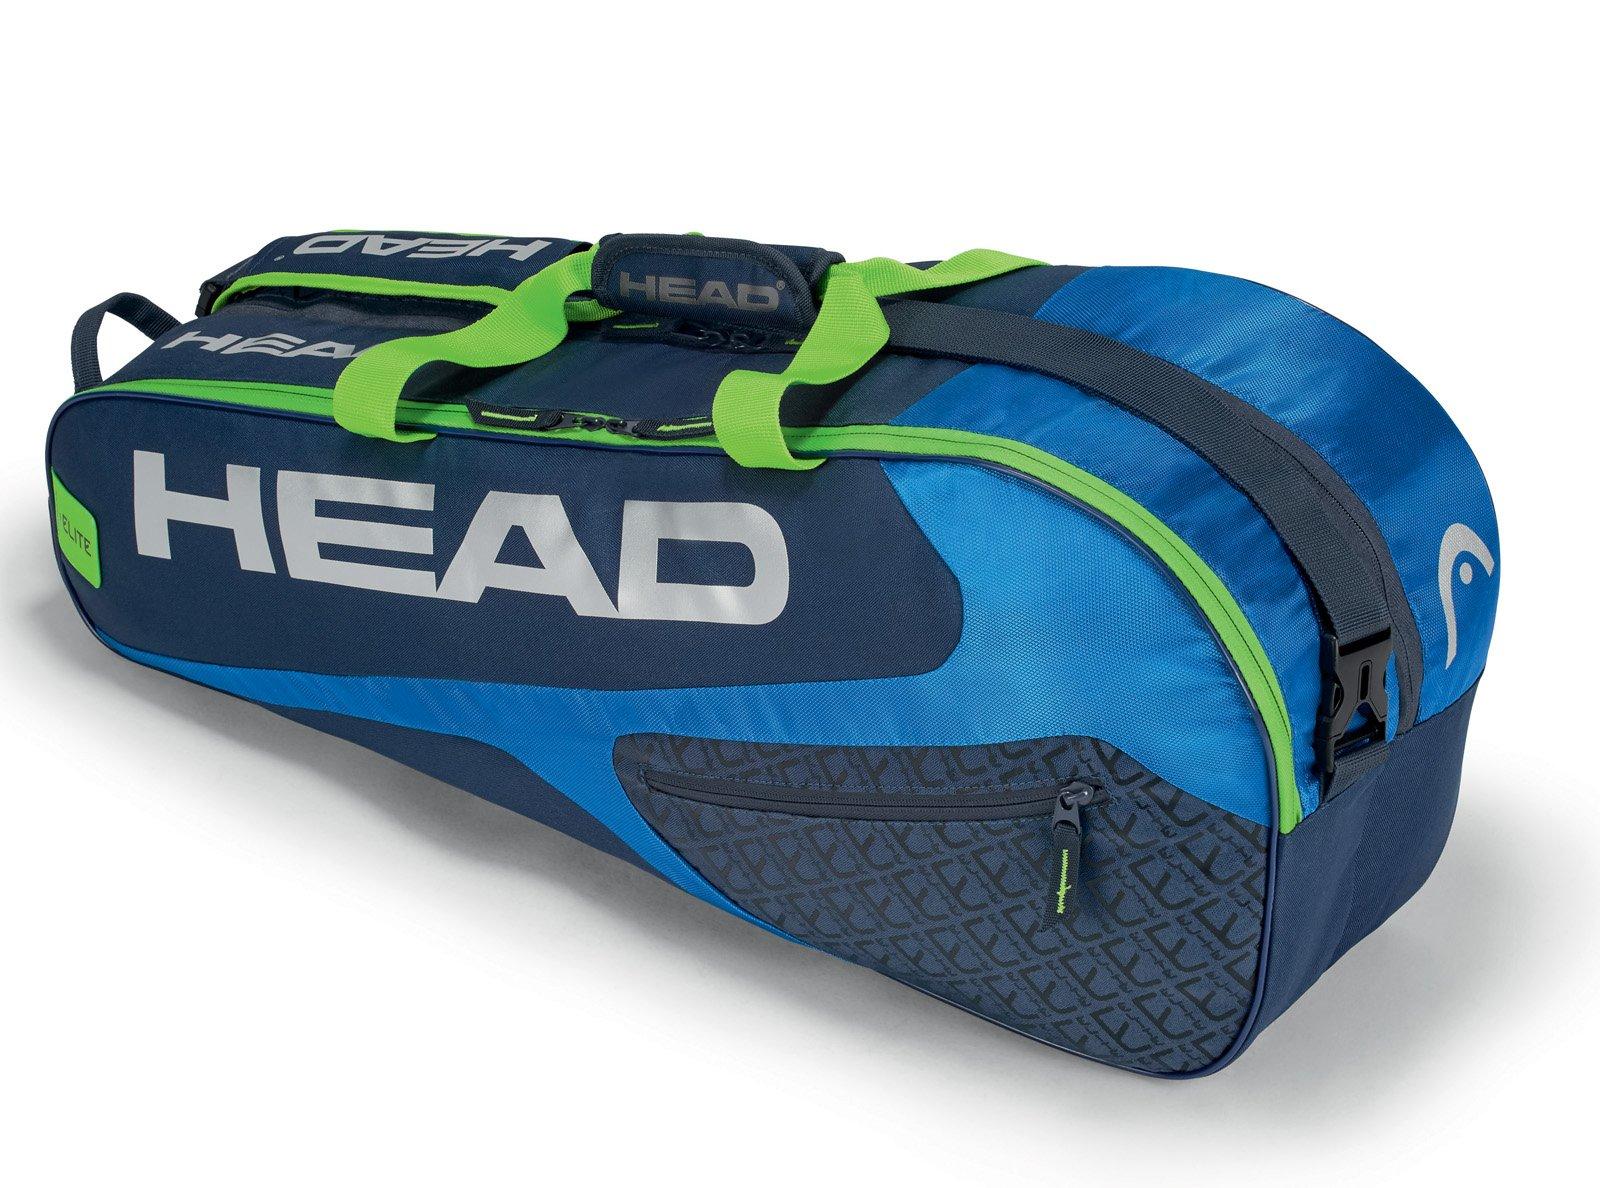 HEAD Elite Combi 6 Racquet Bag (Blue/Green)